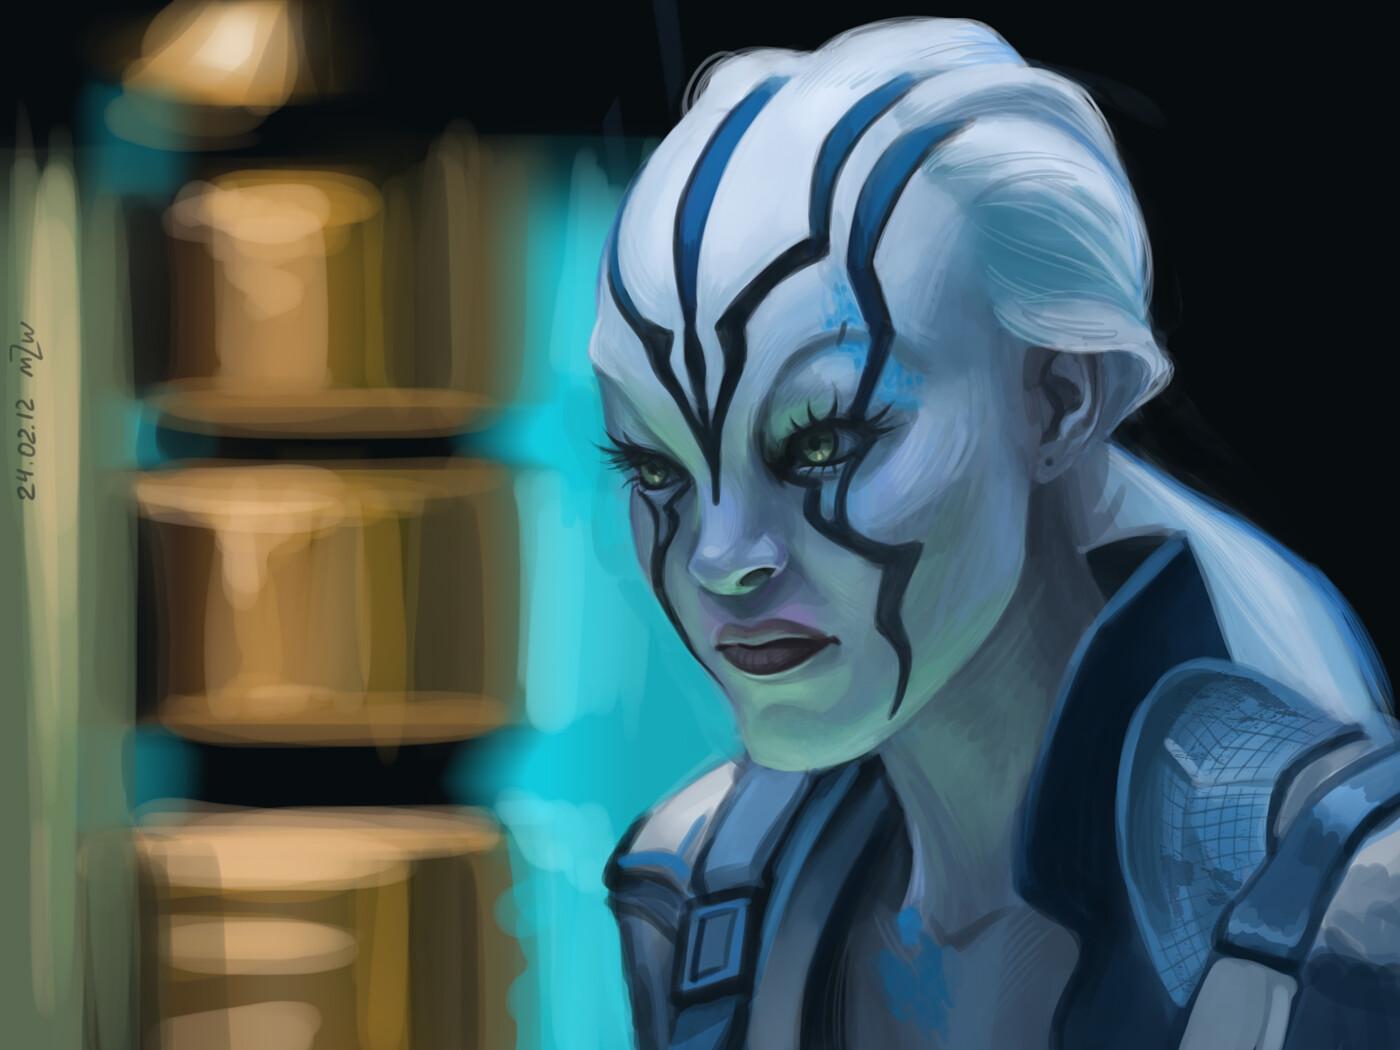 Jaylah from Star Trek Beyond